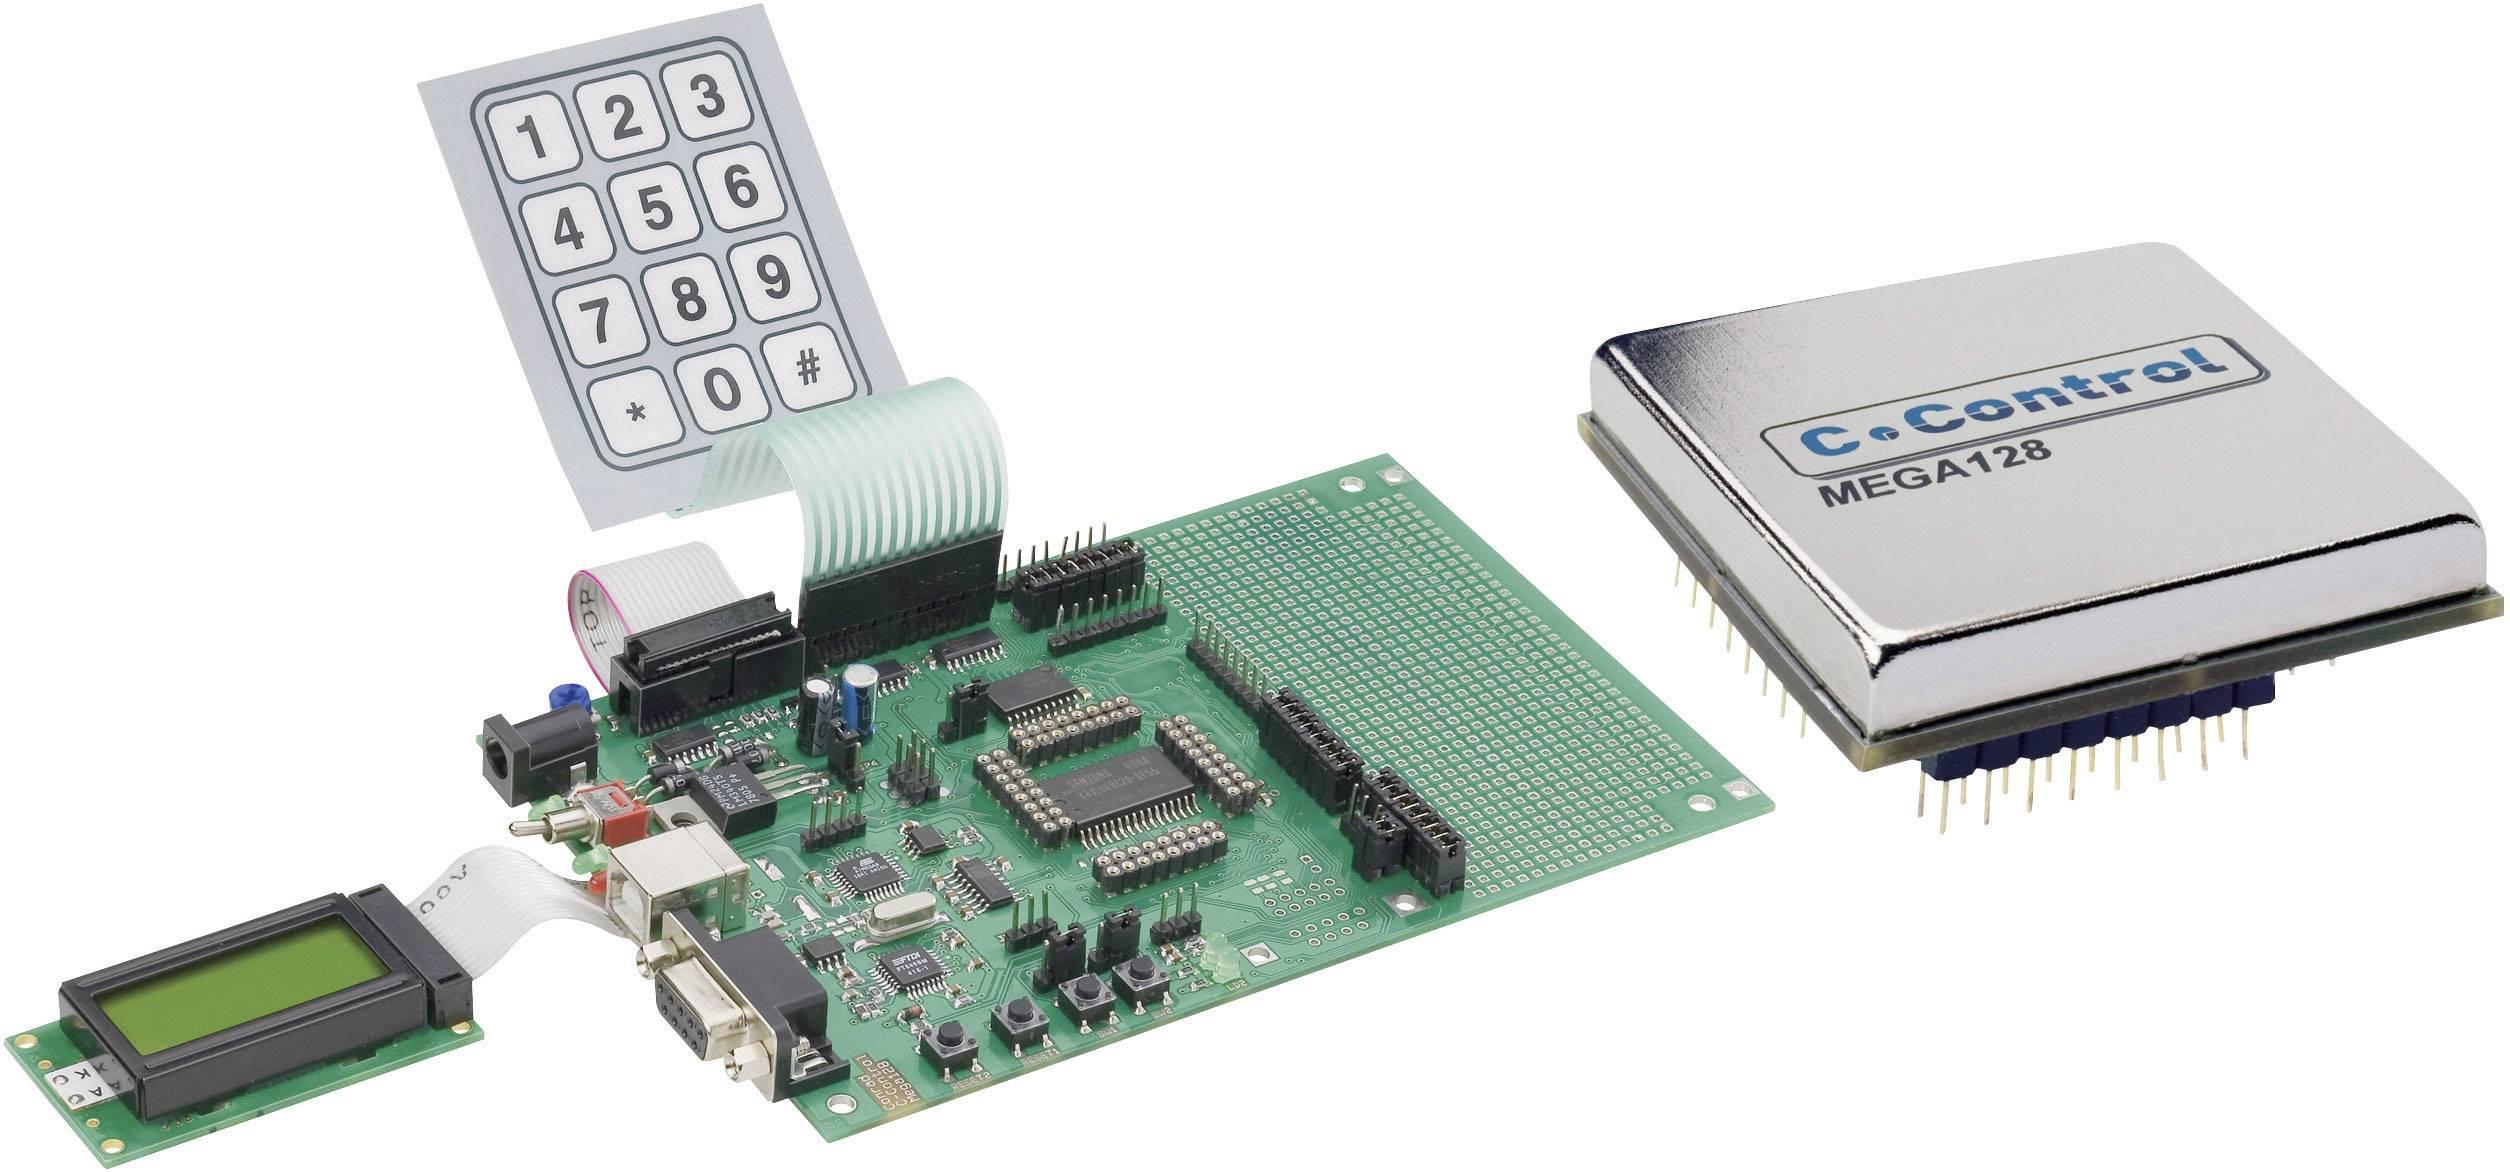 Štartovacia sada C-Control PRO Mega 128 Spar-Set 198484